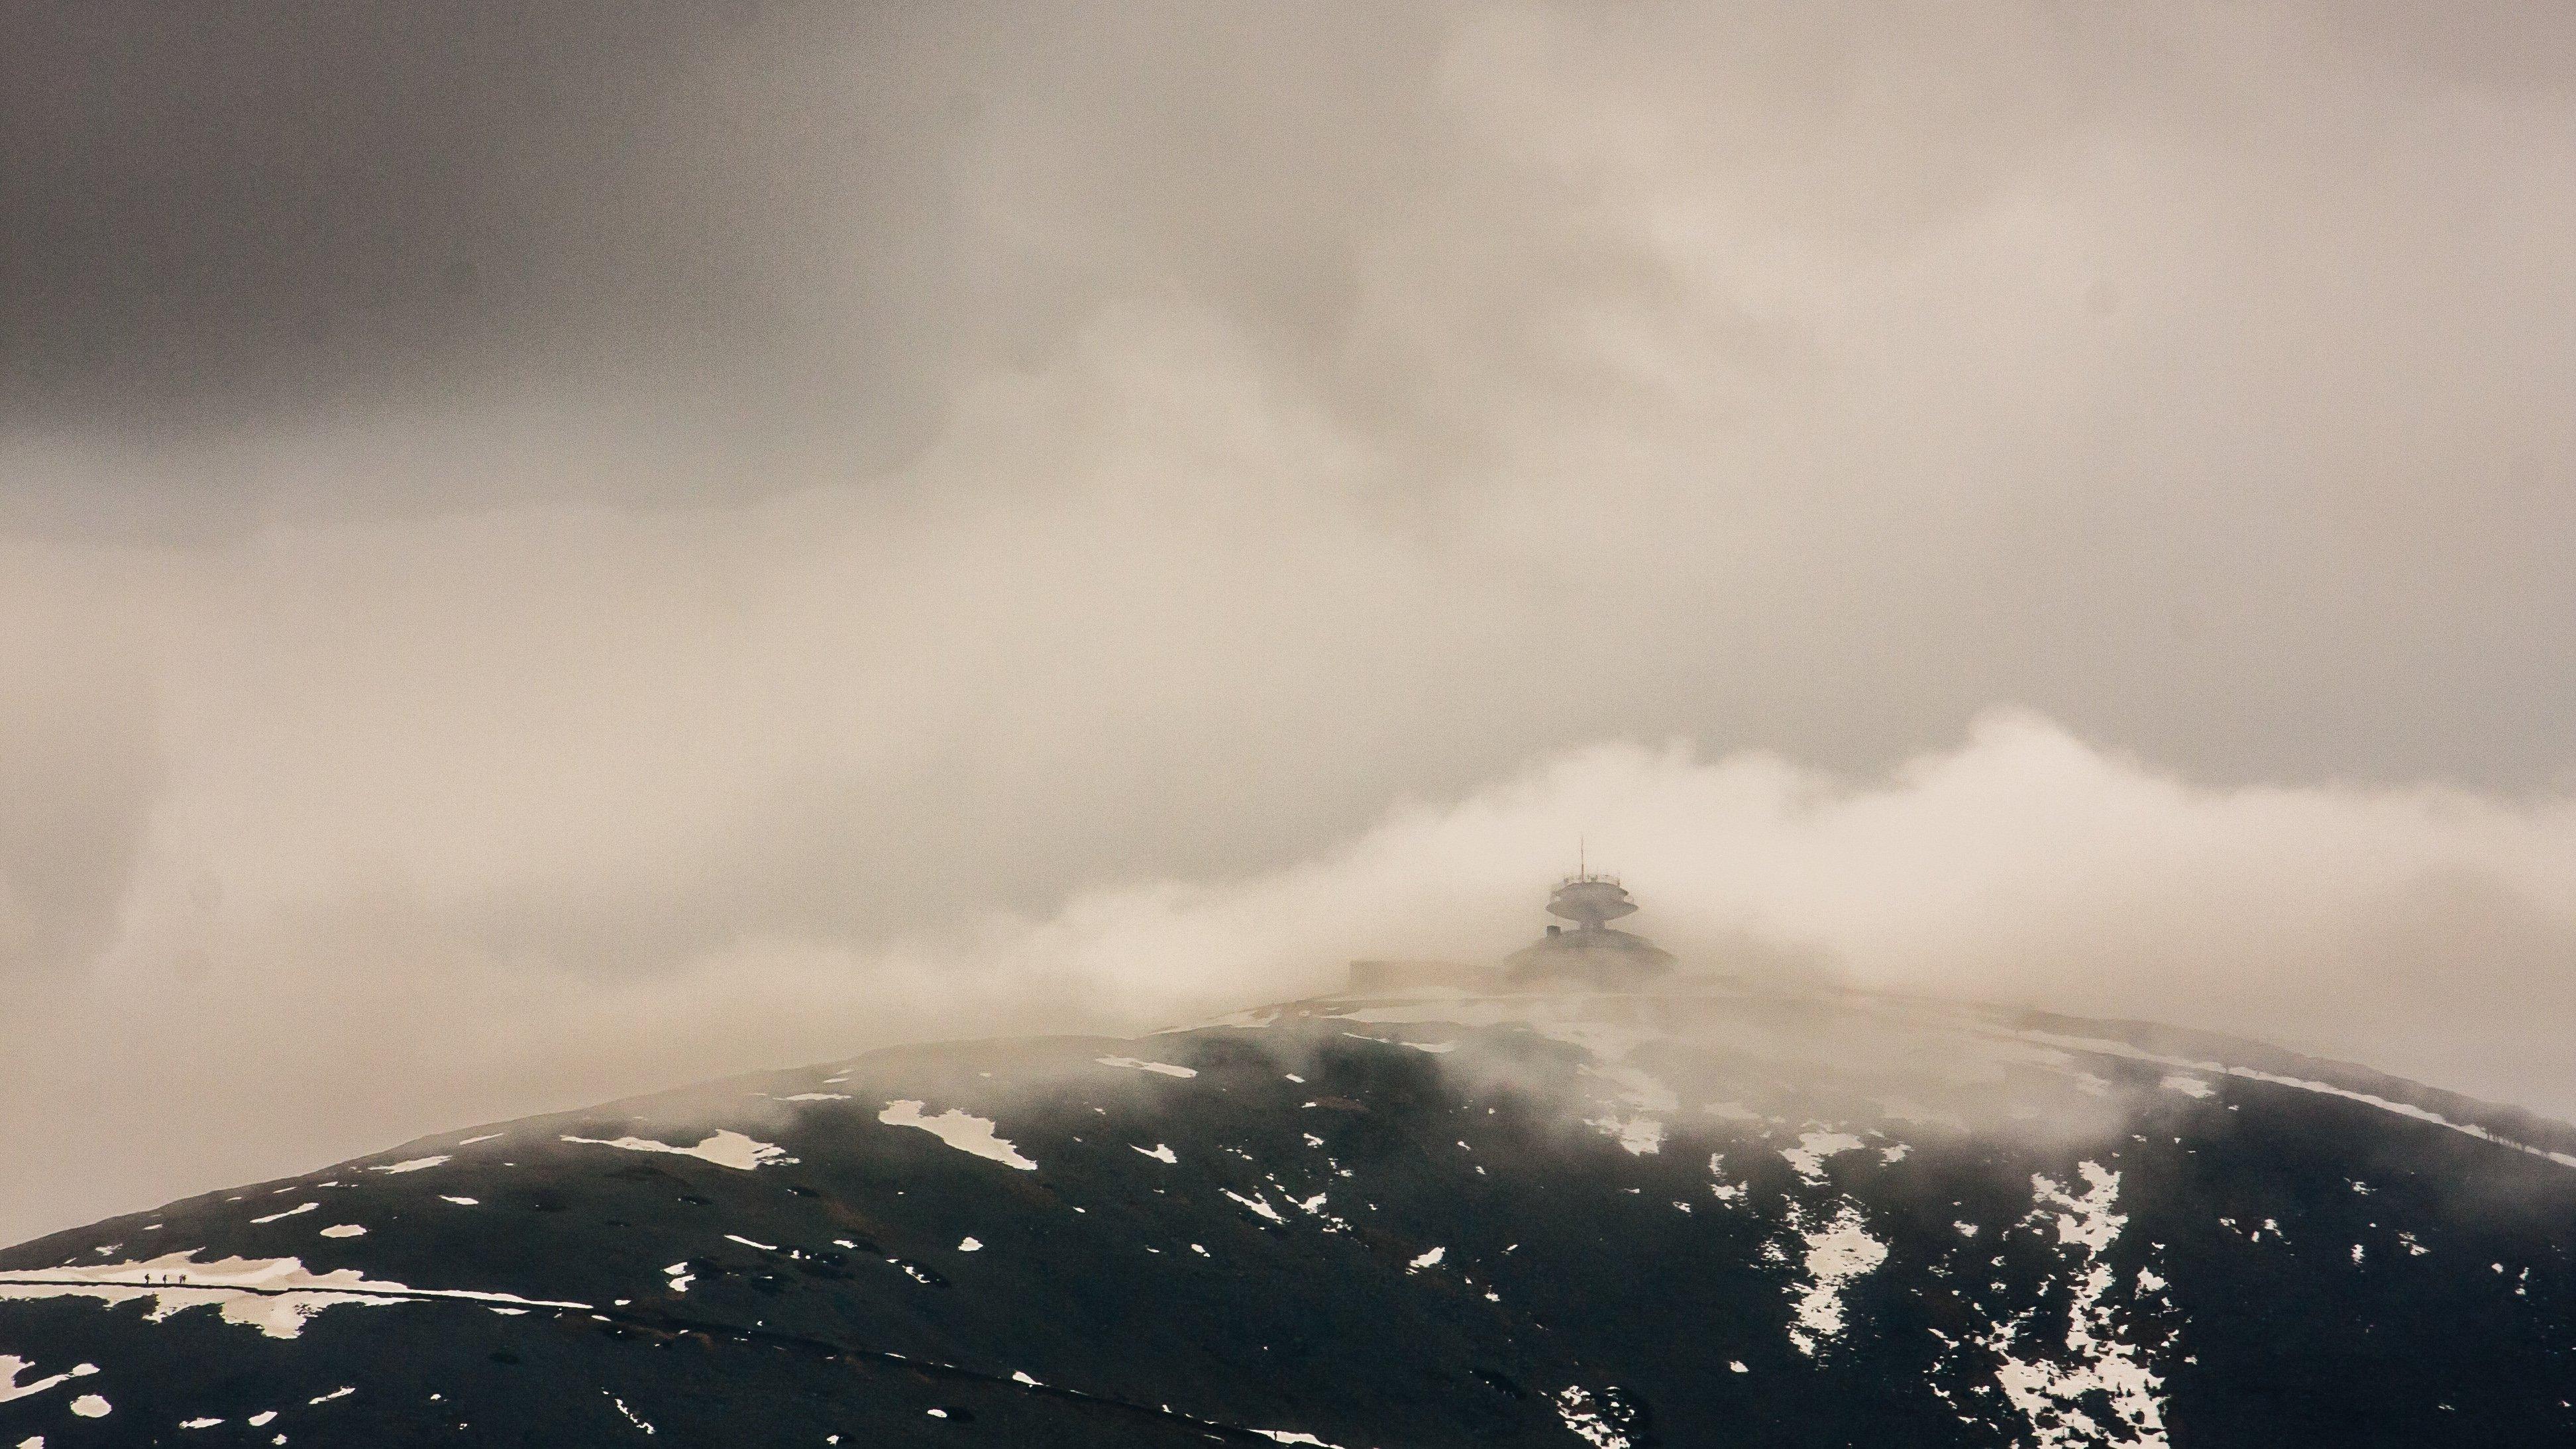 cloudy mountain phone wallpaper - photo #19